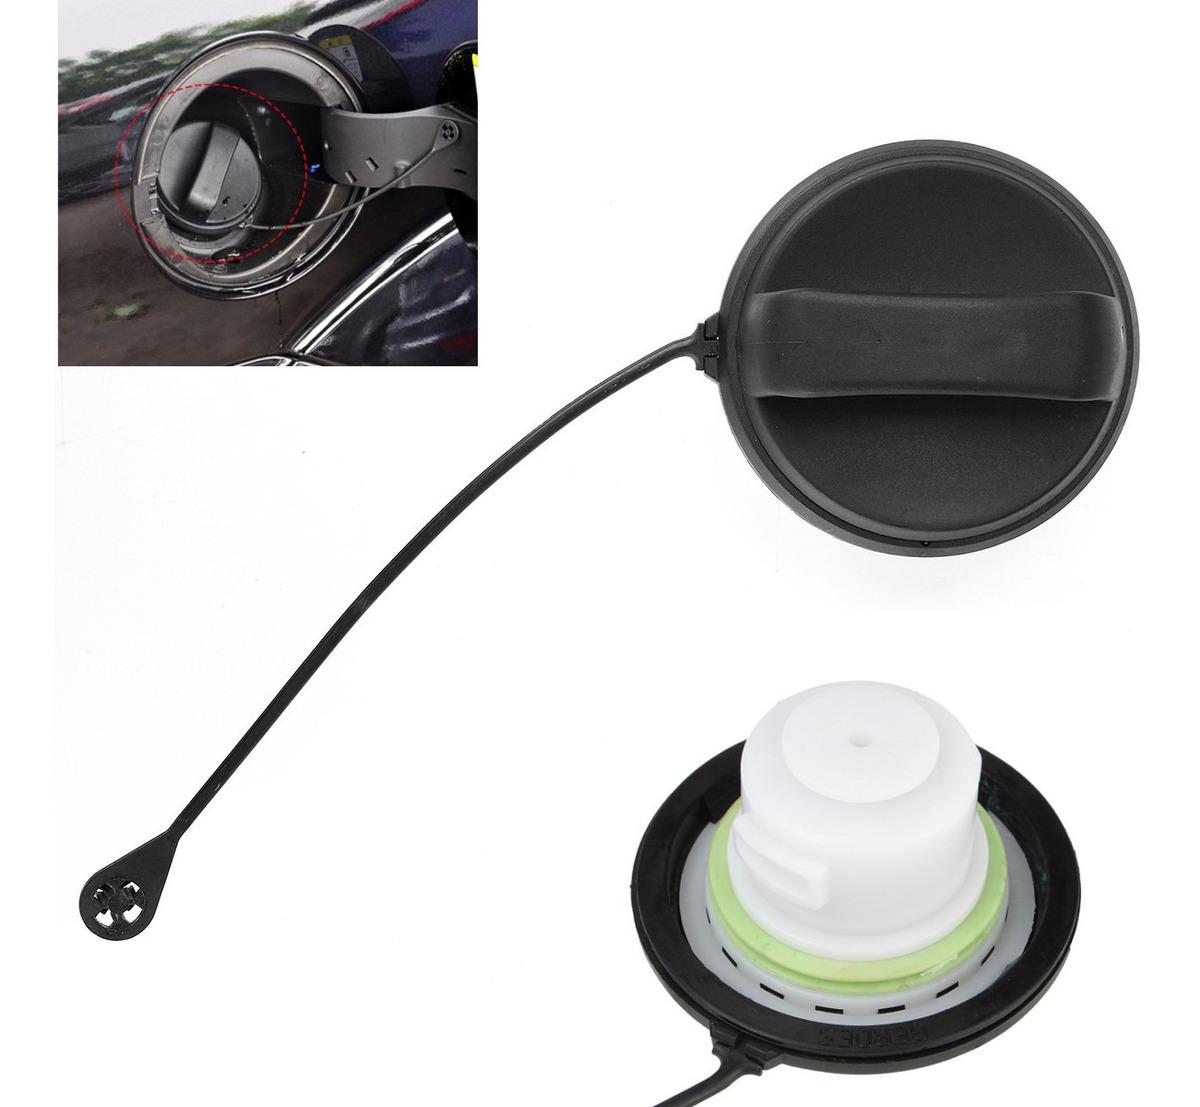 Tapa dep/ósito de combustible Tap/ón del Tanque Gasolina Durable Negro para Focus 2 II MK2 2005-2014